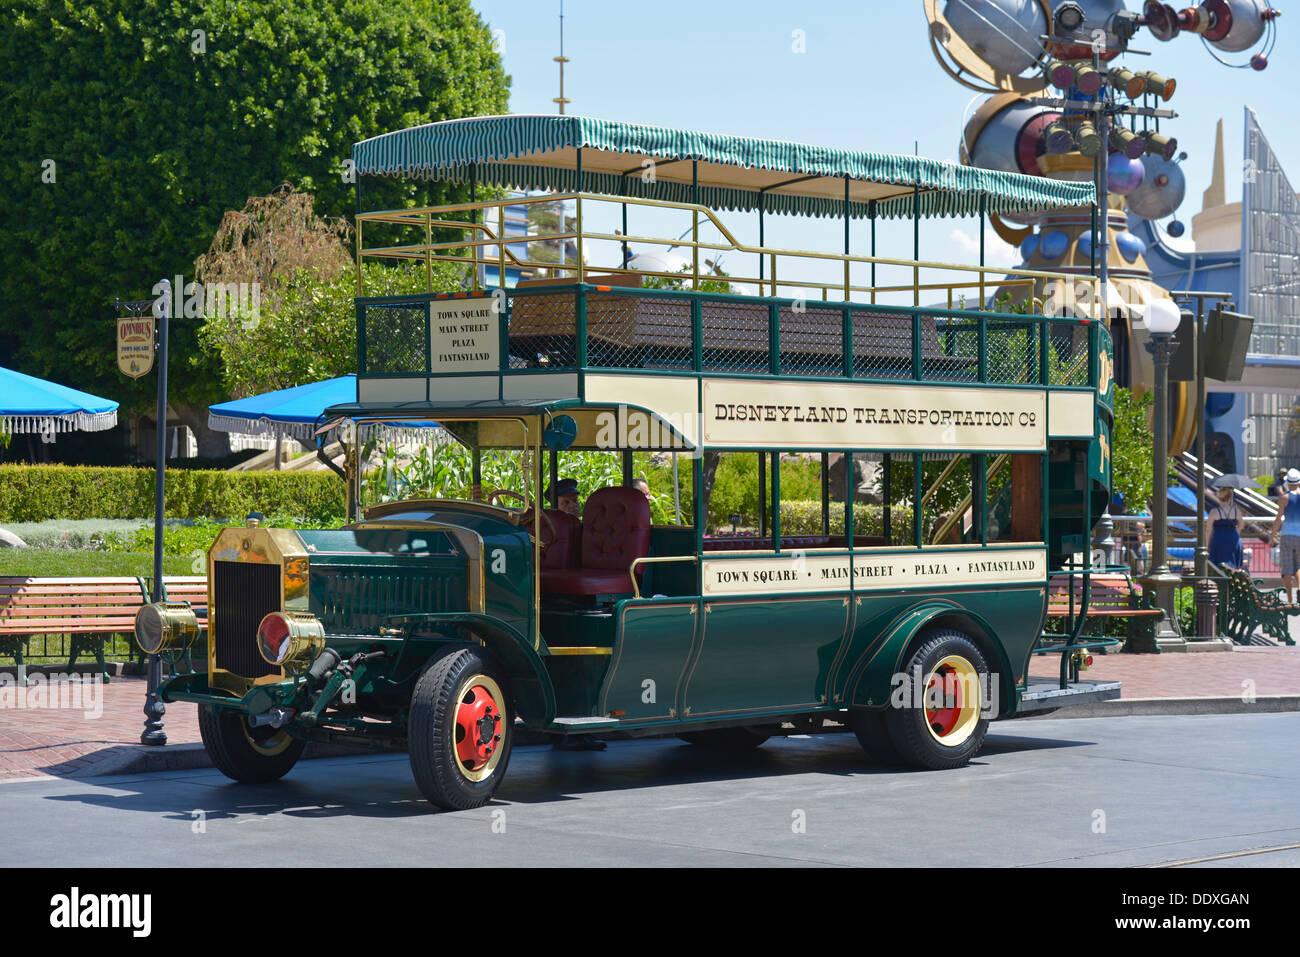 Disneyland Transporte, tranvía, autobús, Anaheim, California Imagen De Stock